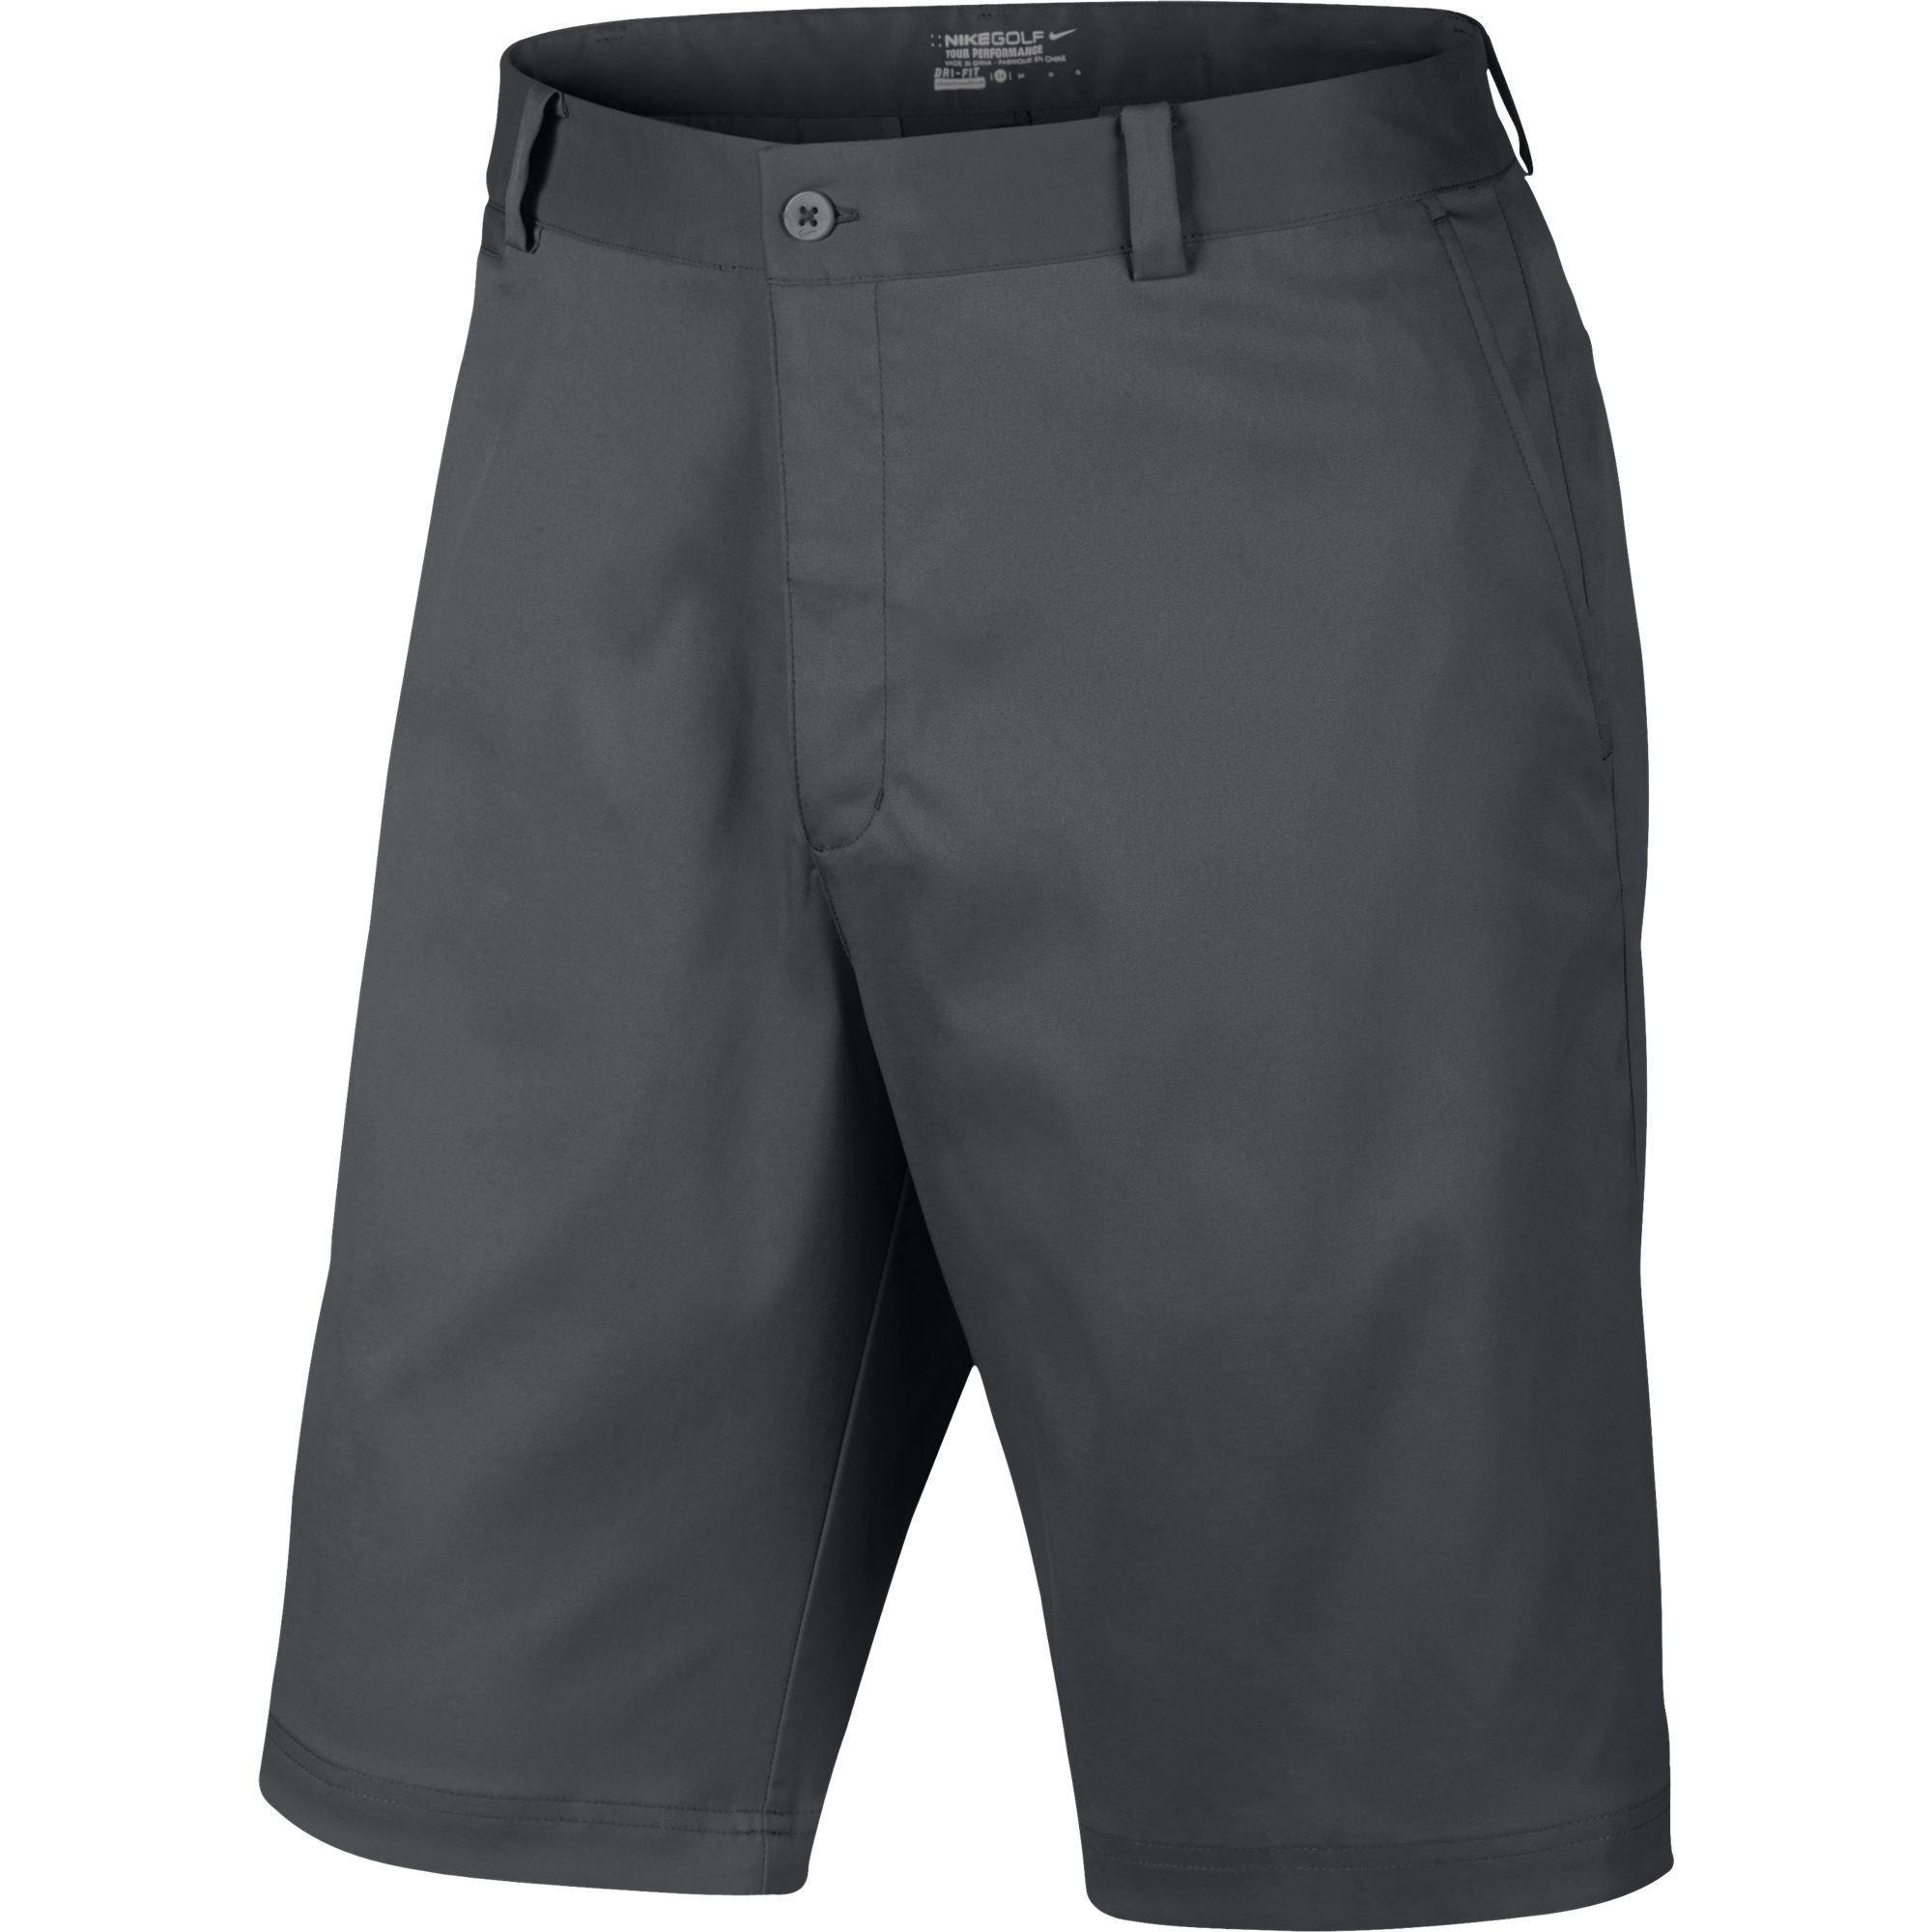 Nike Golf Flat Front Short Dark Grey 38 by NIKE (Image #1)